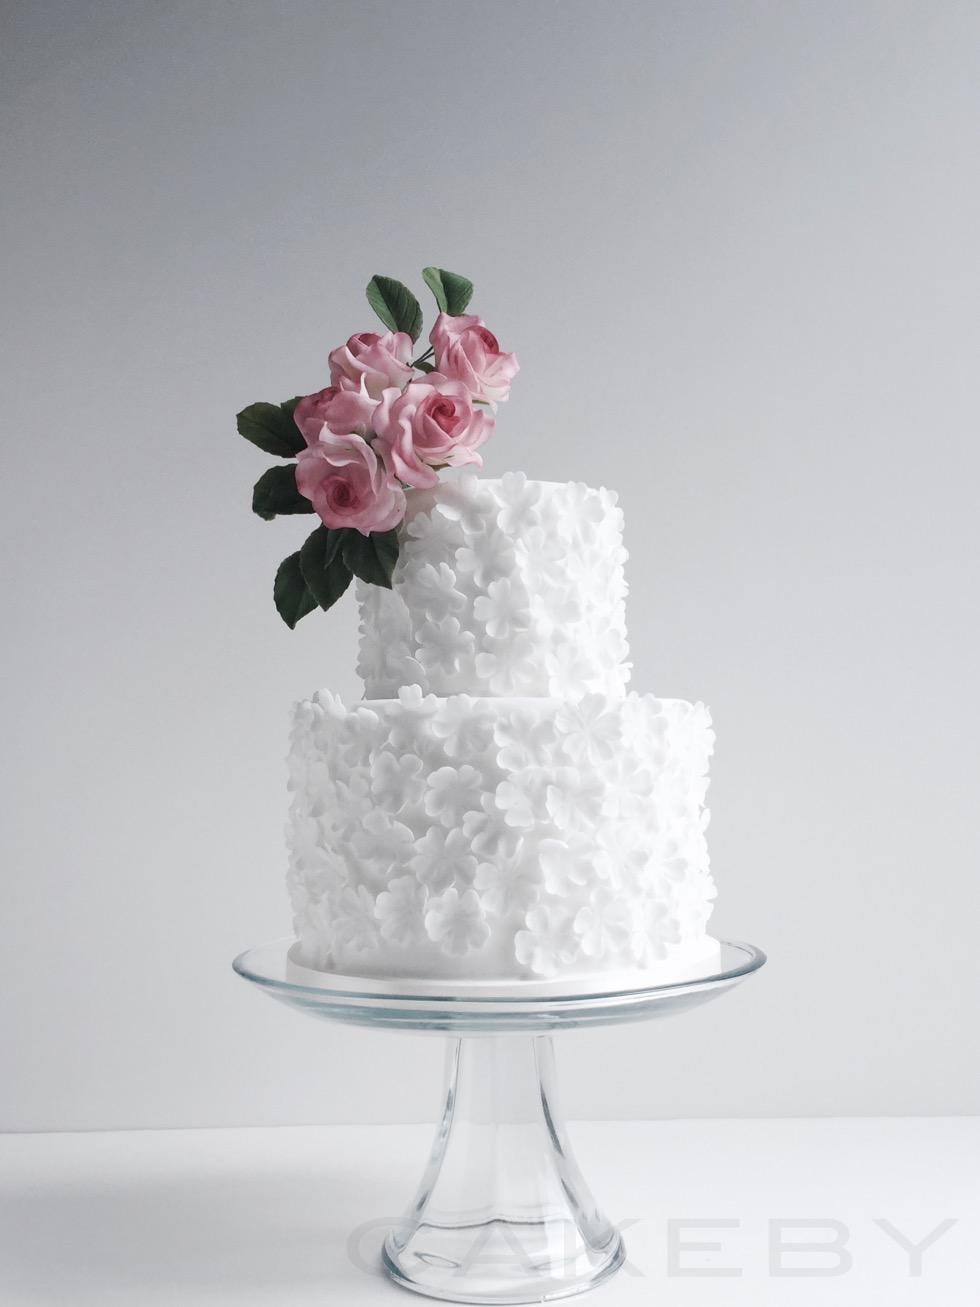 cakeby.jp rose cake